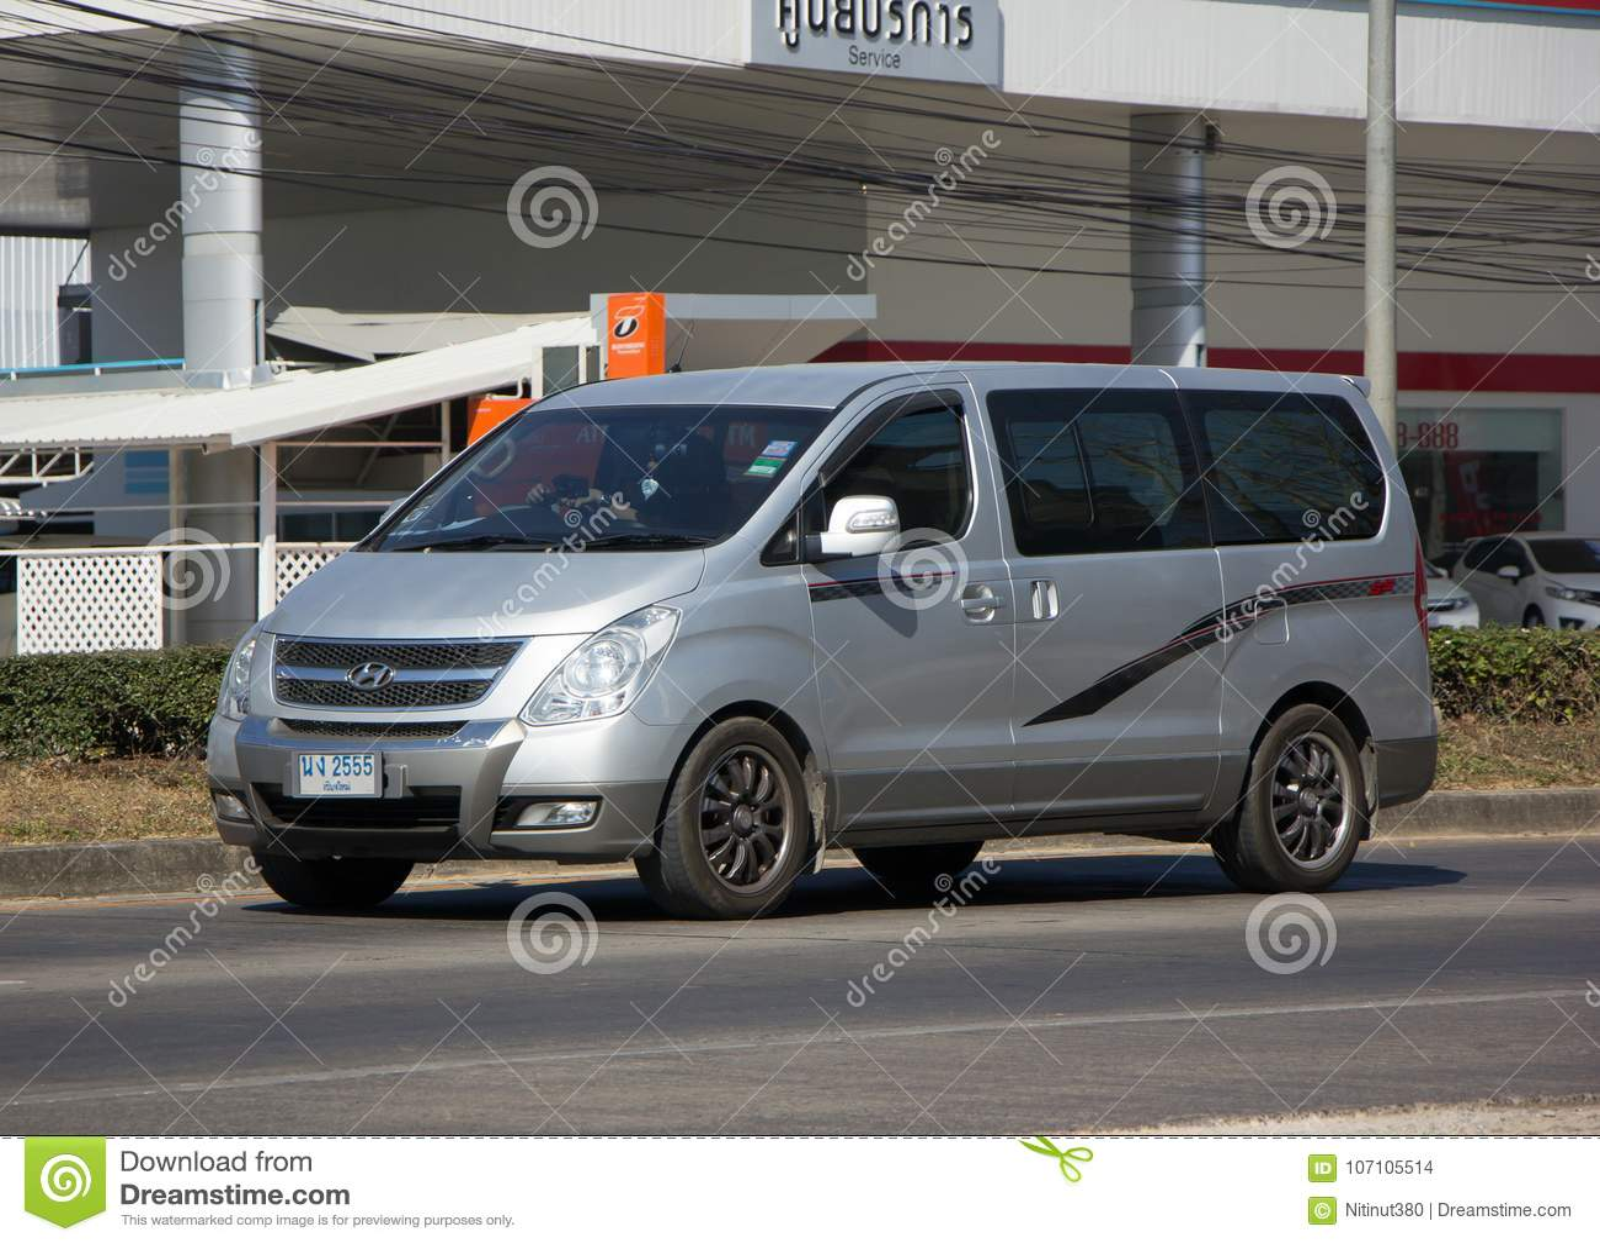 Luxury Van From Hyundai Korea. Hyundai H1. Editorial Stock ...